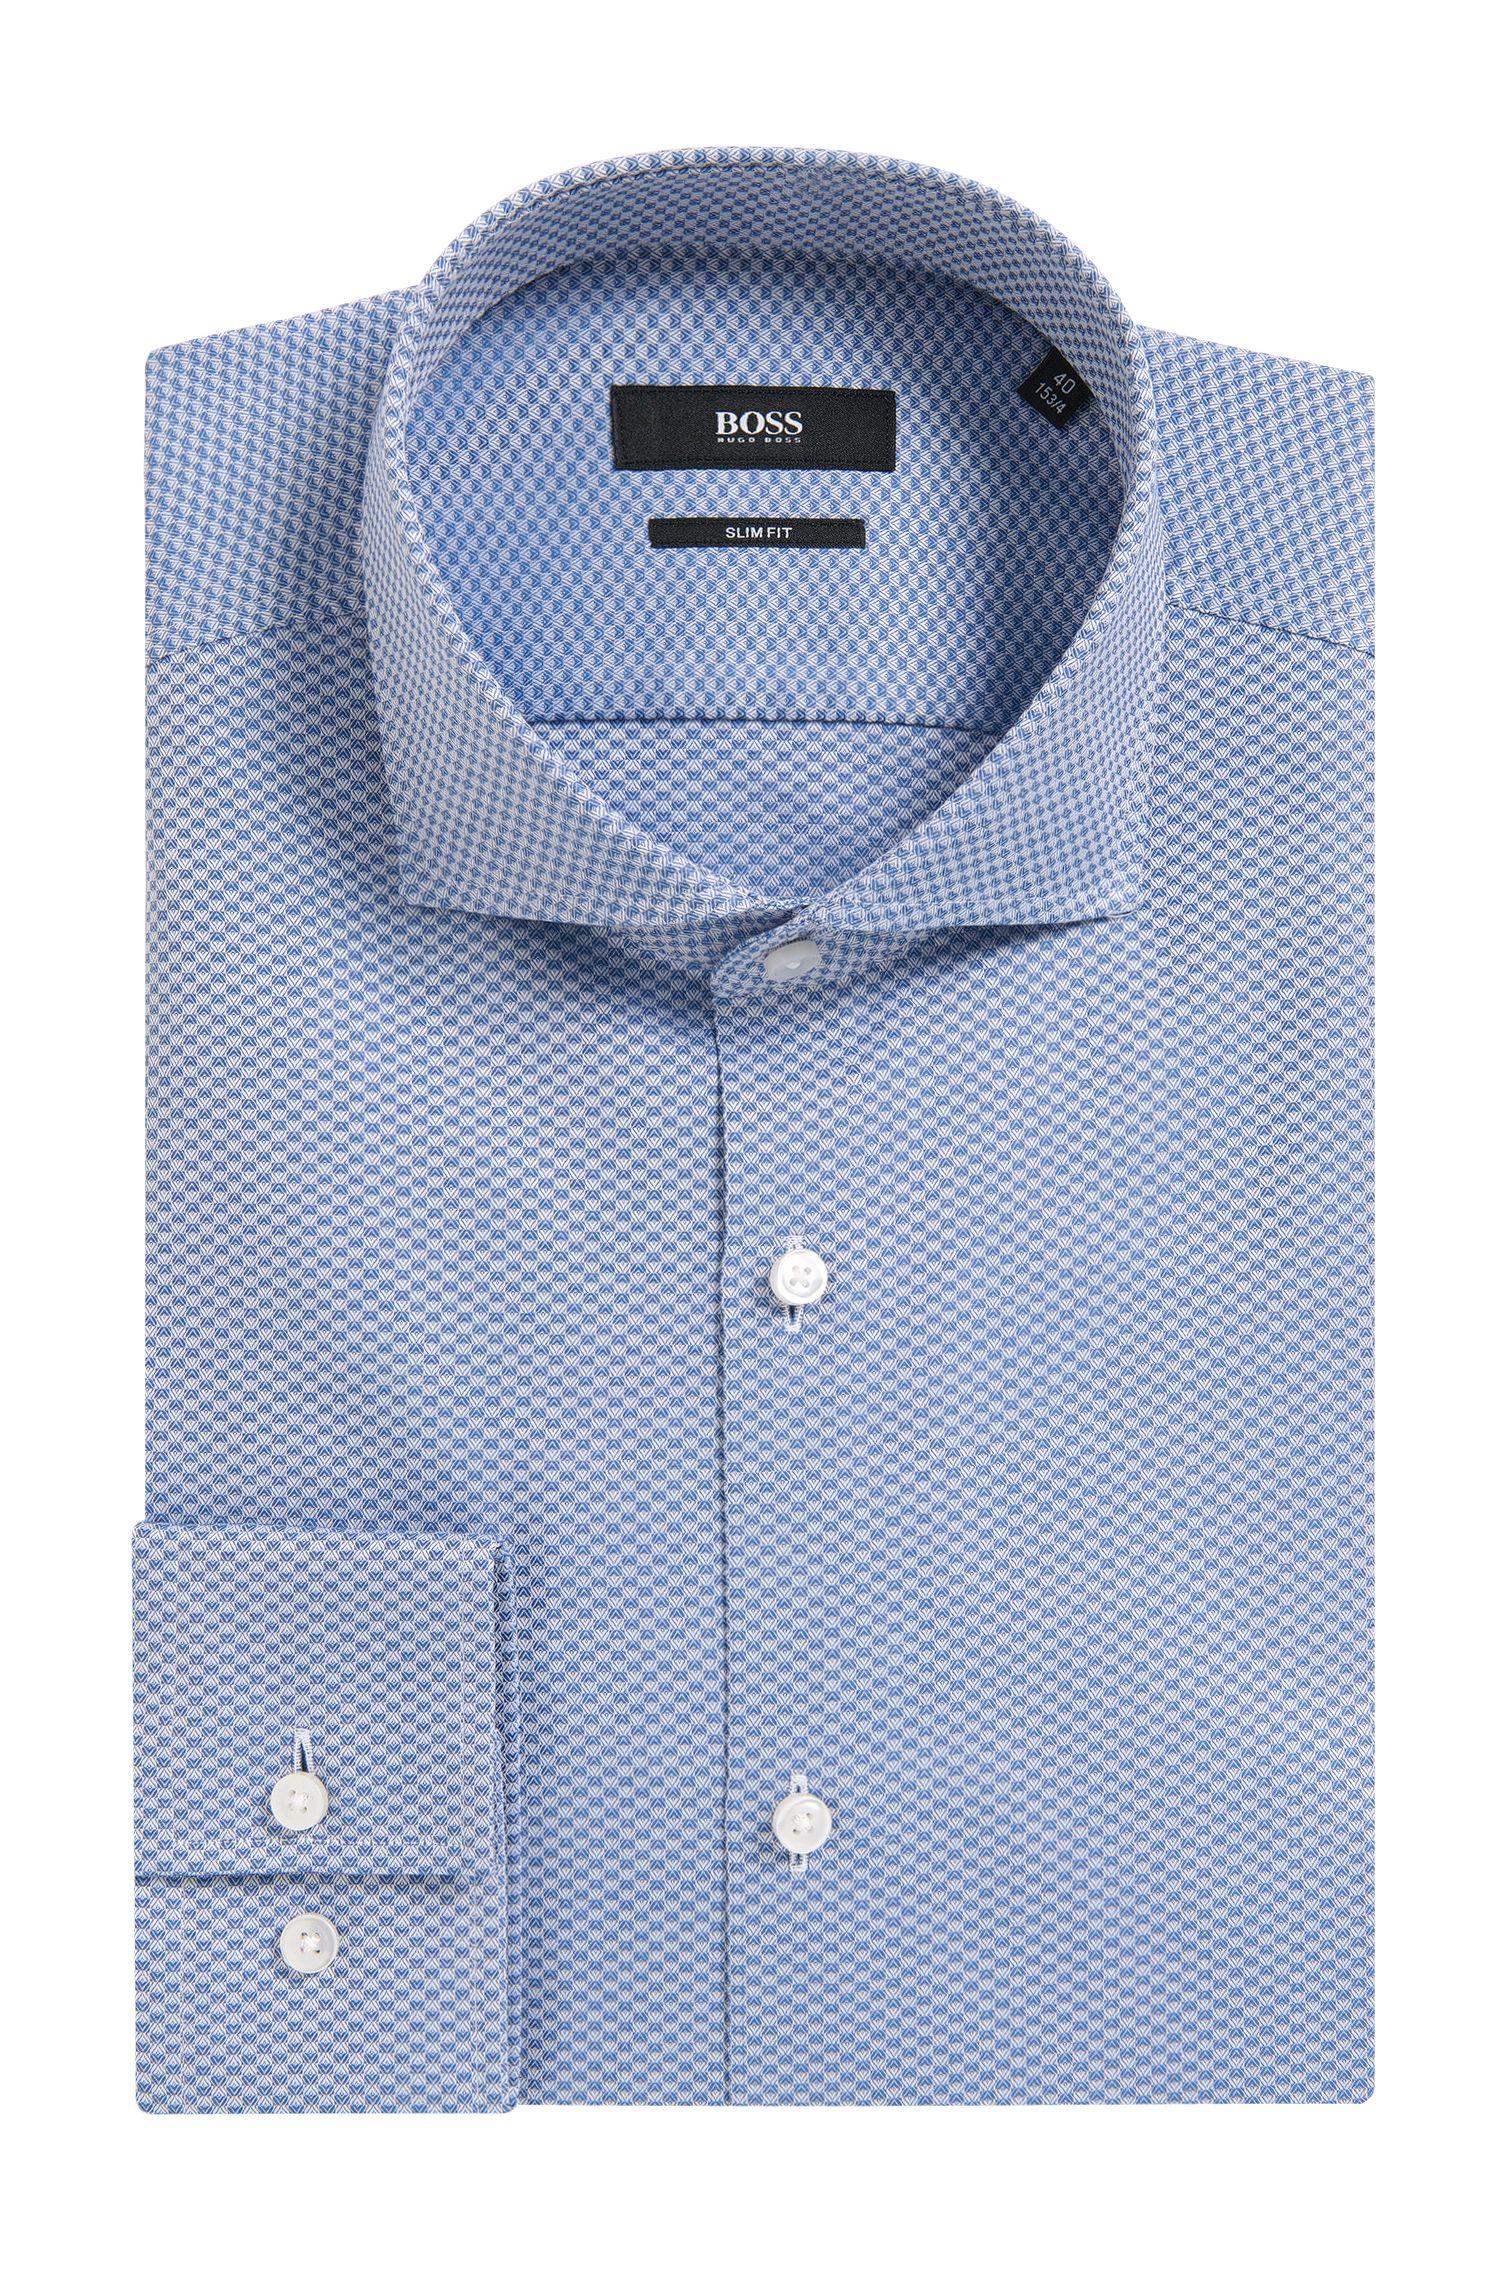 Jason' | Slim Fit, Italian Cotton Dress Shirt